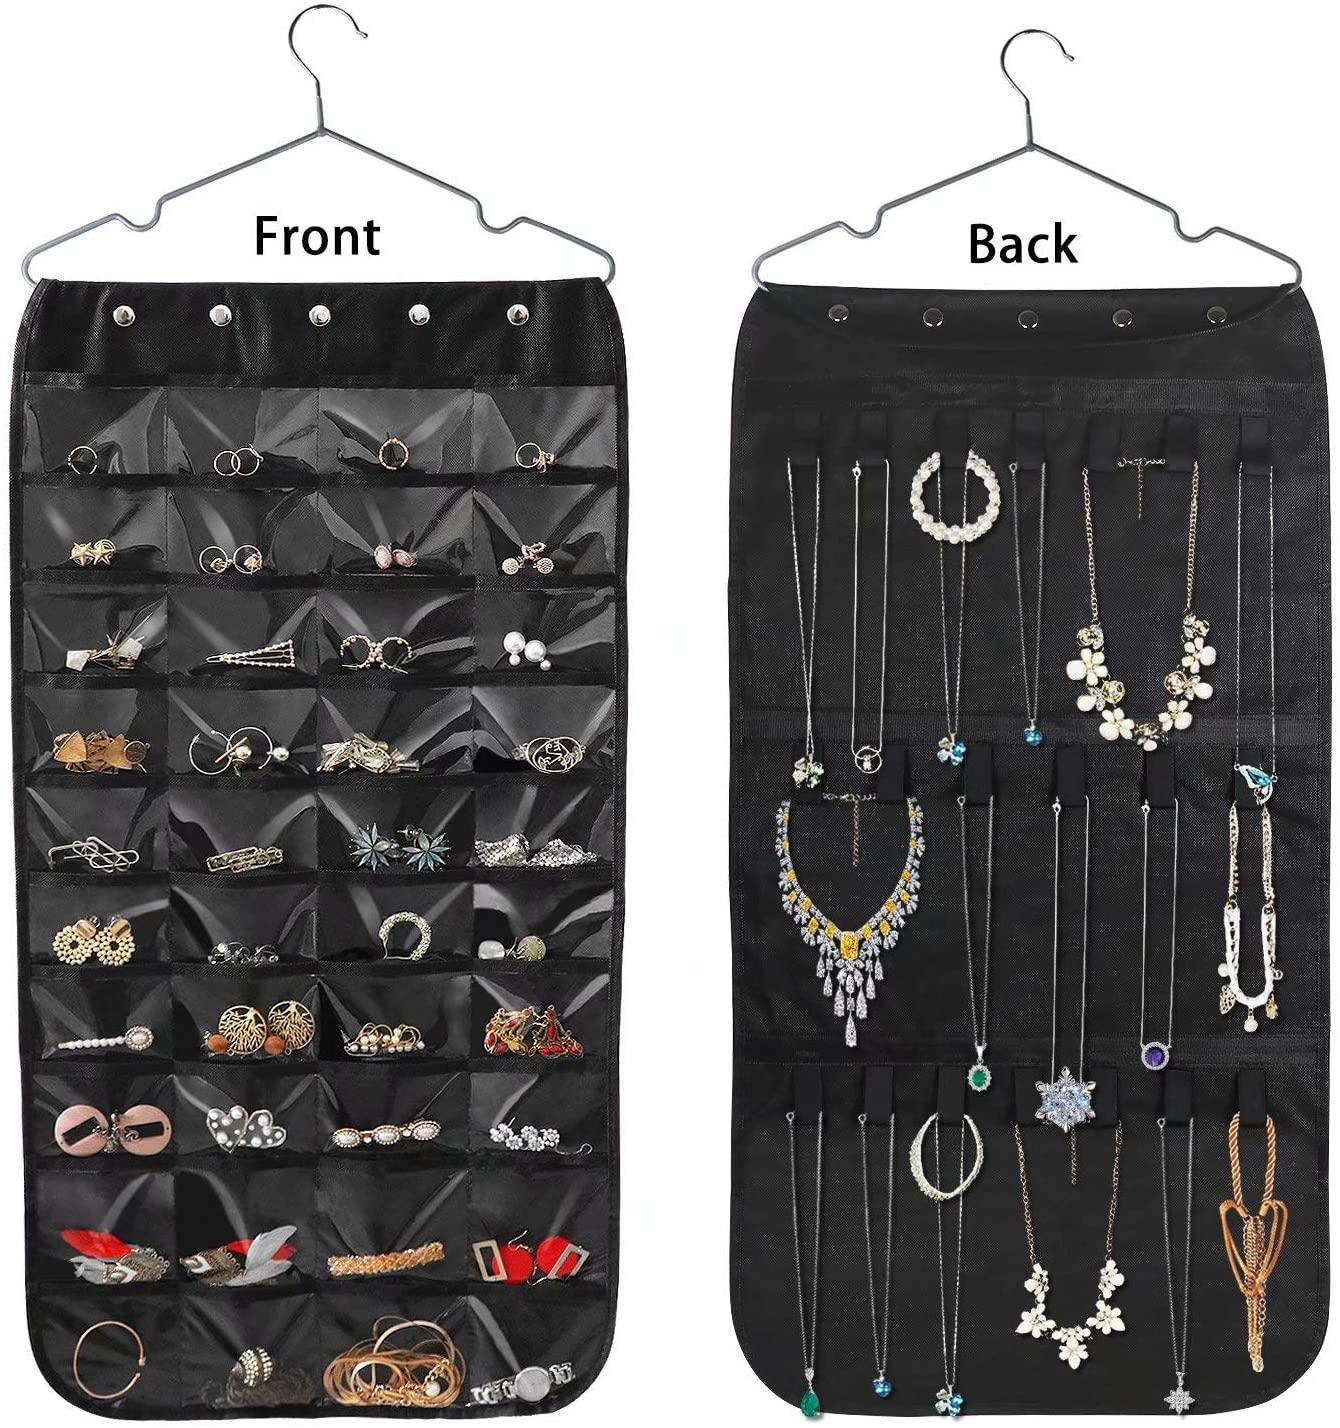 Beaverve hanging jewelry organizer, how to organize a closet